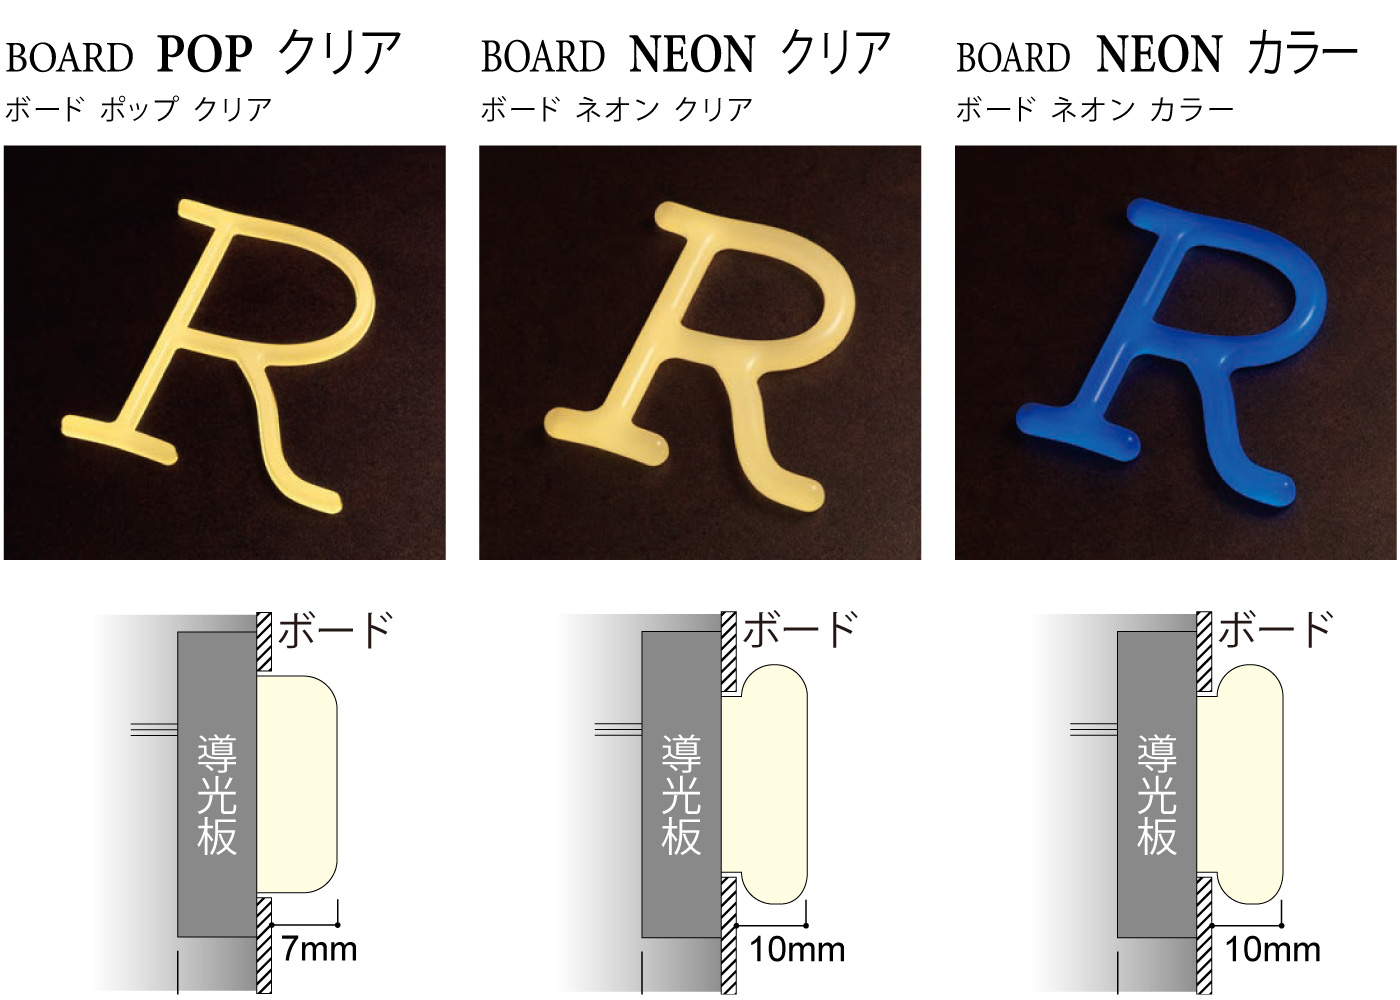 LEDIUS SIGN BOARD POP クリア / NEON クリア / NEON  カラーの商品イメージ・仕様の画像